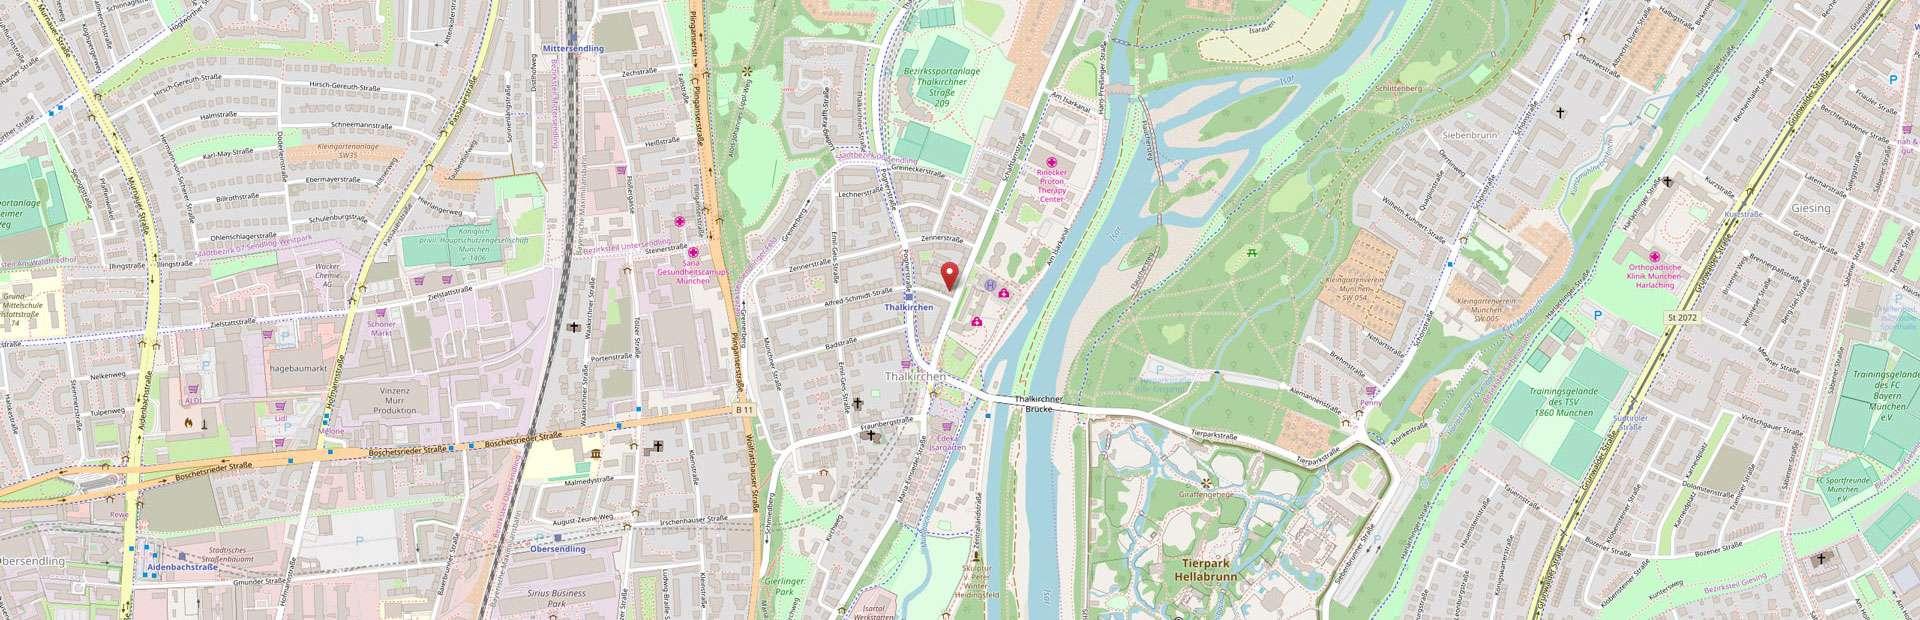 Ristorante & Pizzeria Rosa dei Venti - Schäftlarnstraße 166